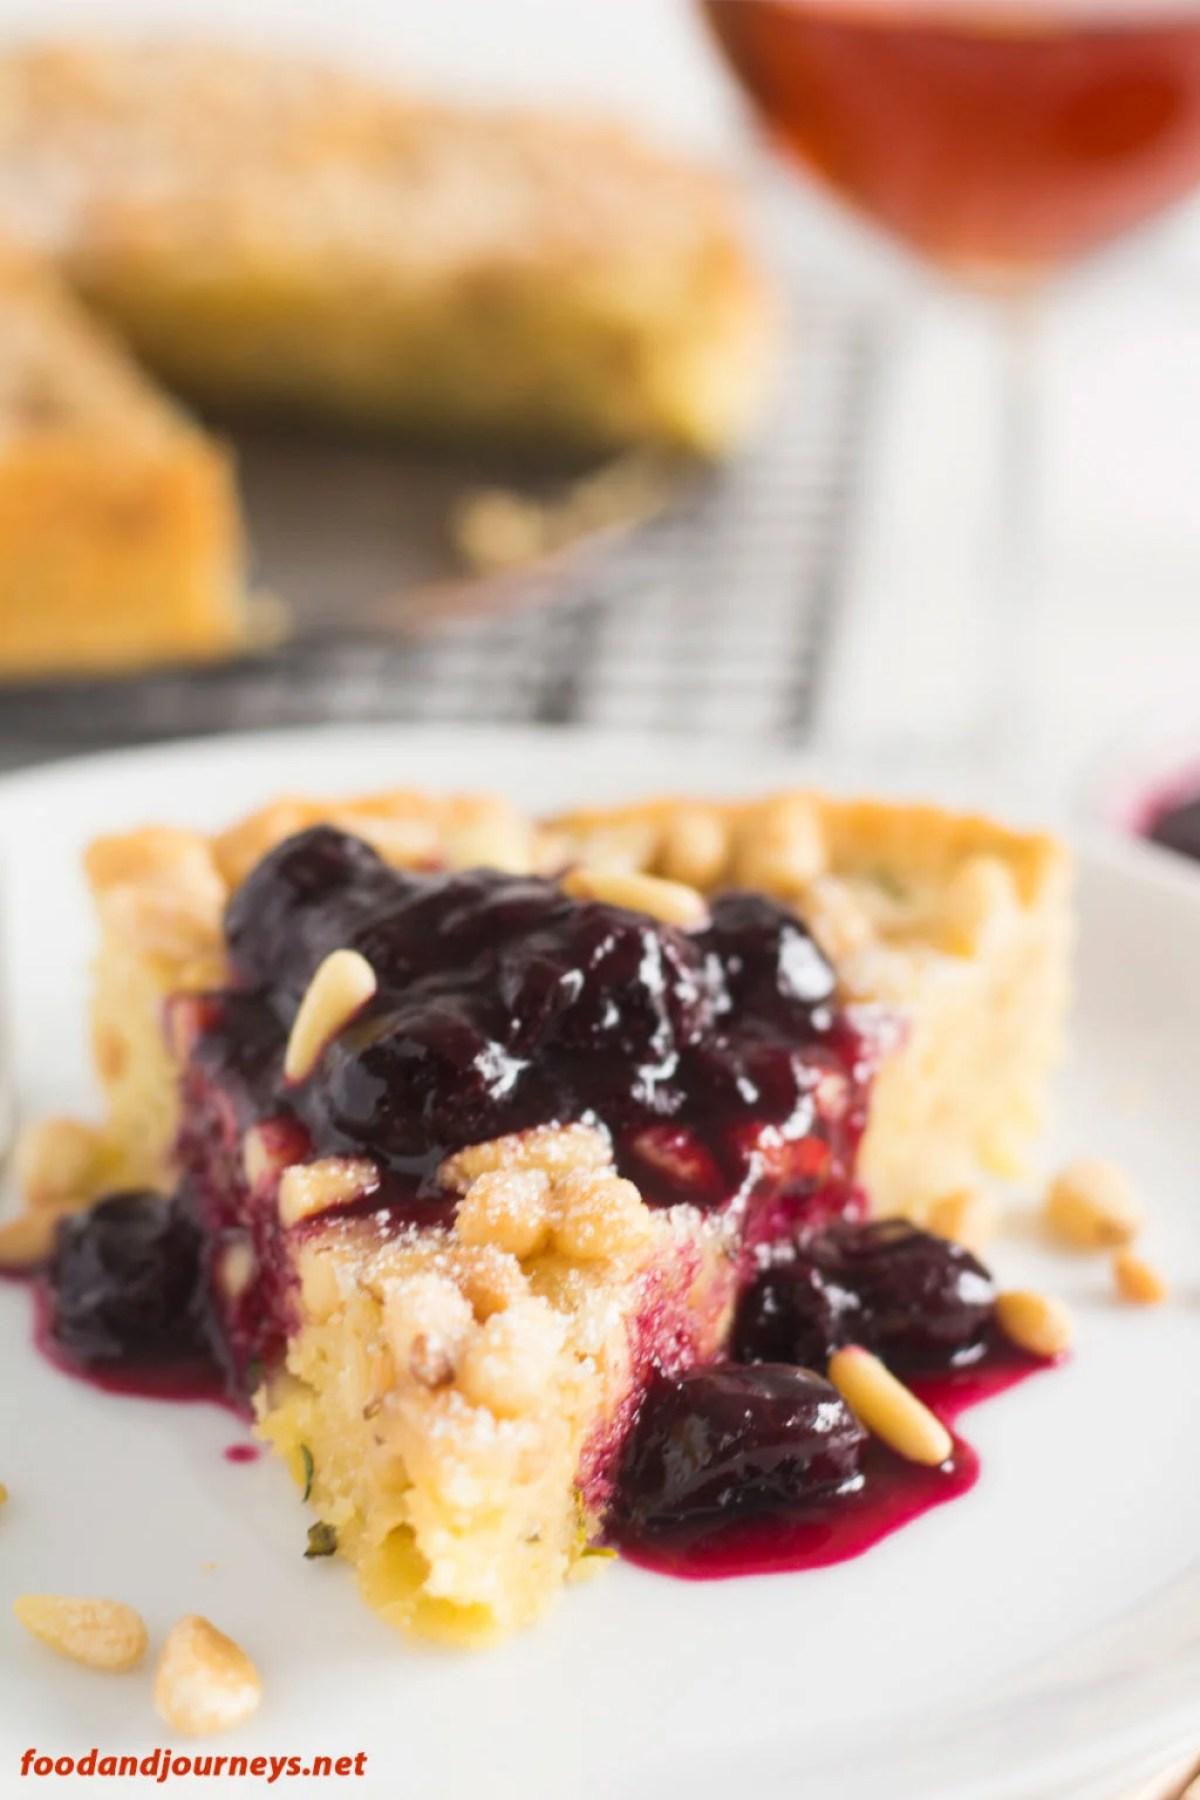 Italian Pine Nut Cake pic1|foodandjourneys.net